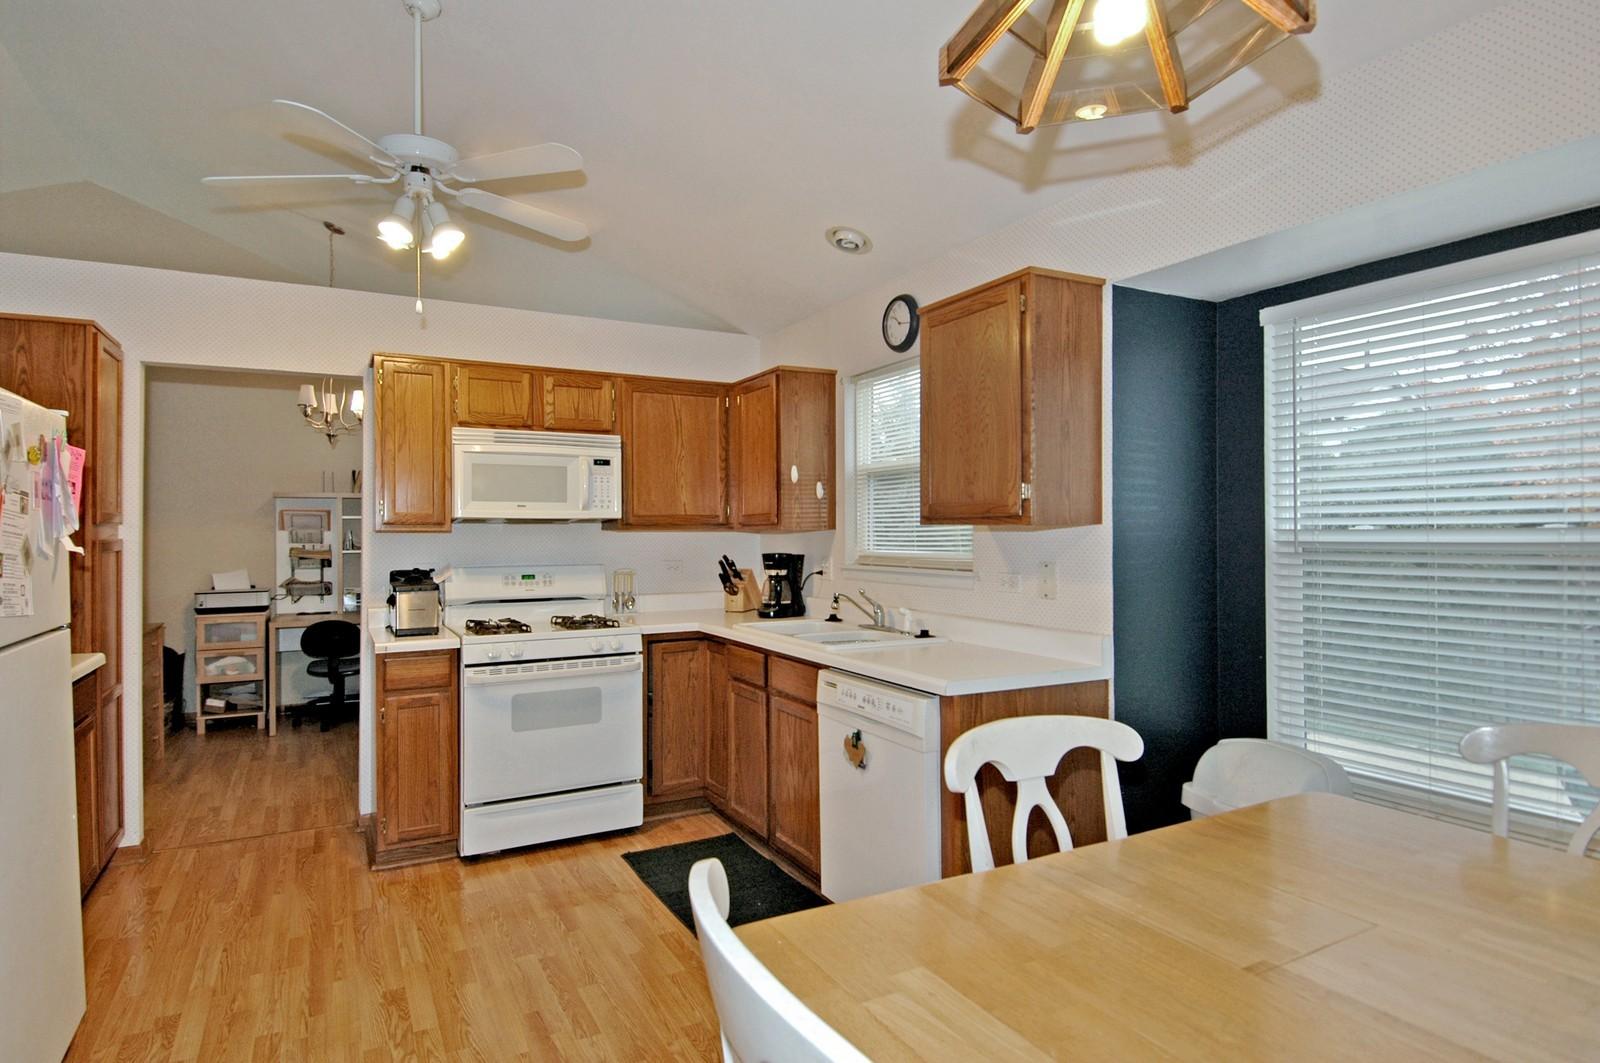 Real Estate Photography - 1764 Kennsington Ln, Crystal Lake, IL, 60014 - Kitchen